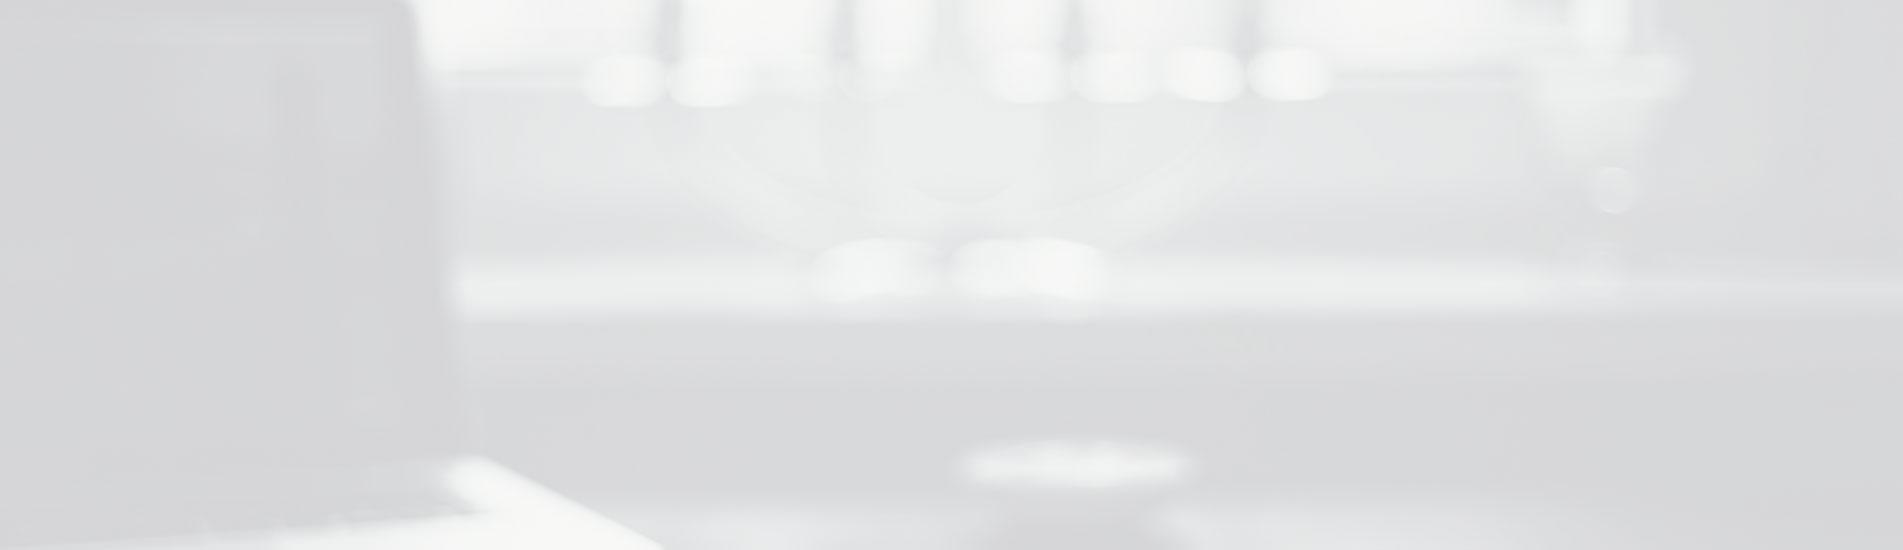 Background - gray